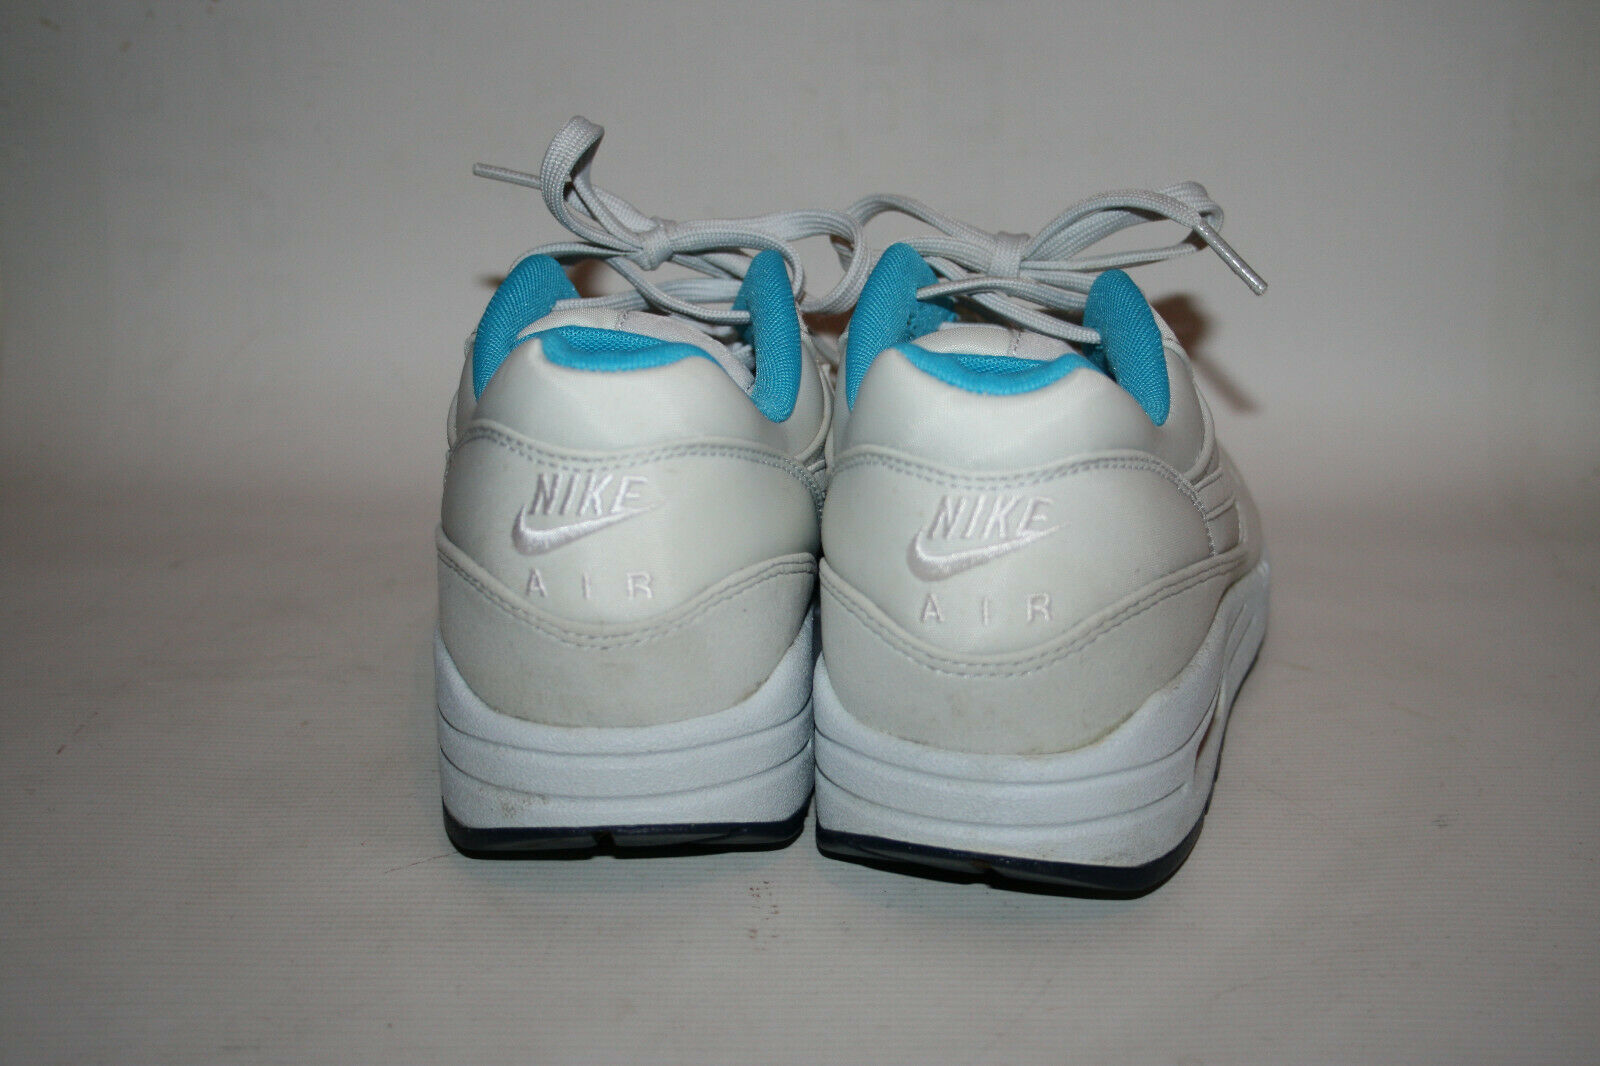 Nike Scarpe Scarpe Scarpe Uomo Air Max 1 Fb 579920-002 BEIGE-BIANCO NUCLEARI synthethic 0f69cd